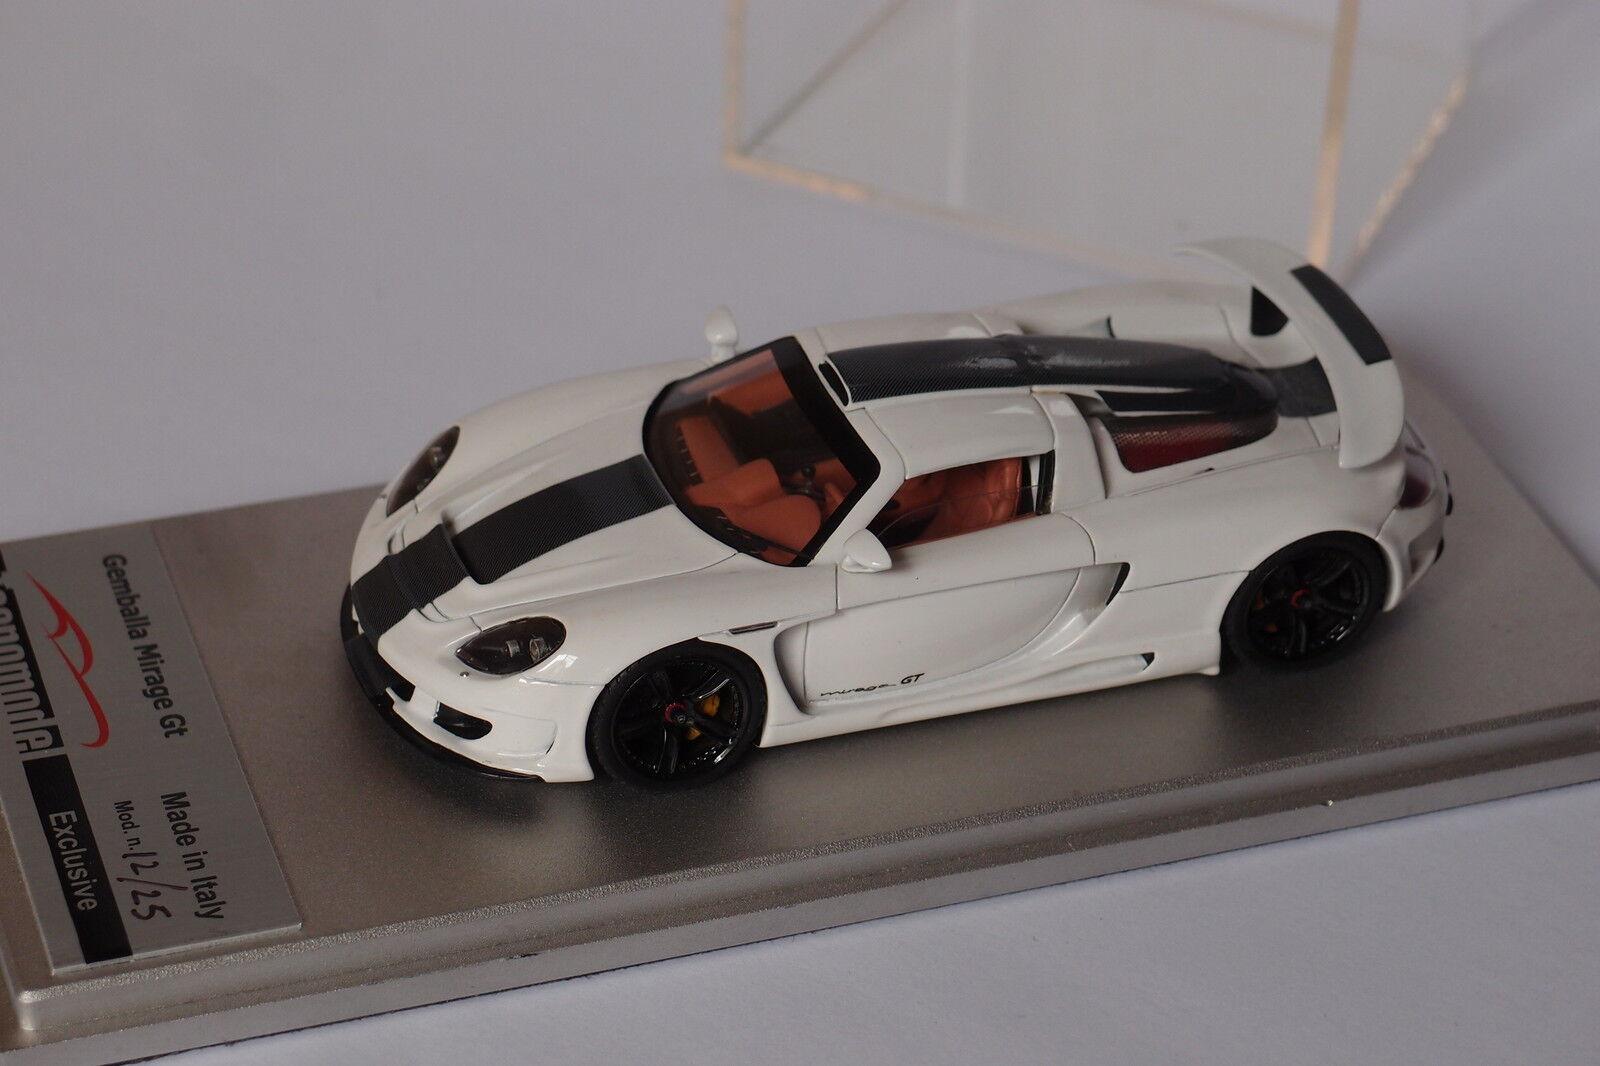 TECNOMODEL GEMBALLA MIRAGE GT white BANDE blackE 1 43